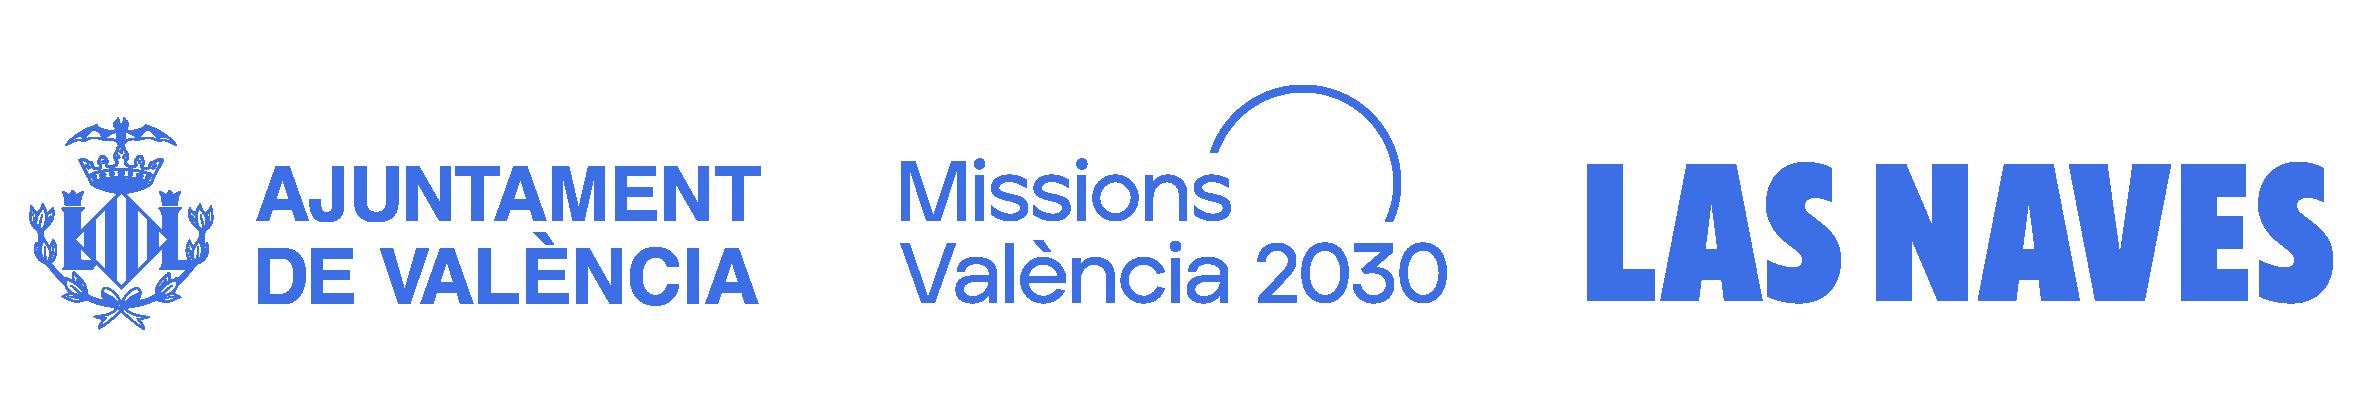 LOGO Ayuntamiento + Missions